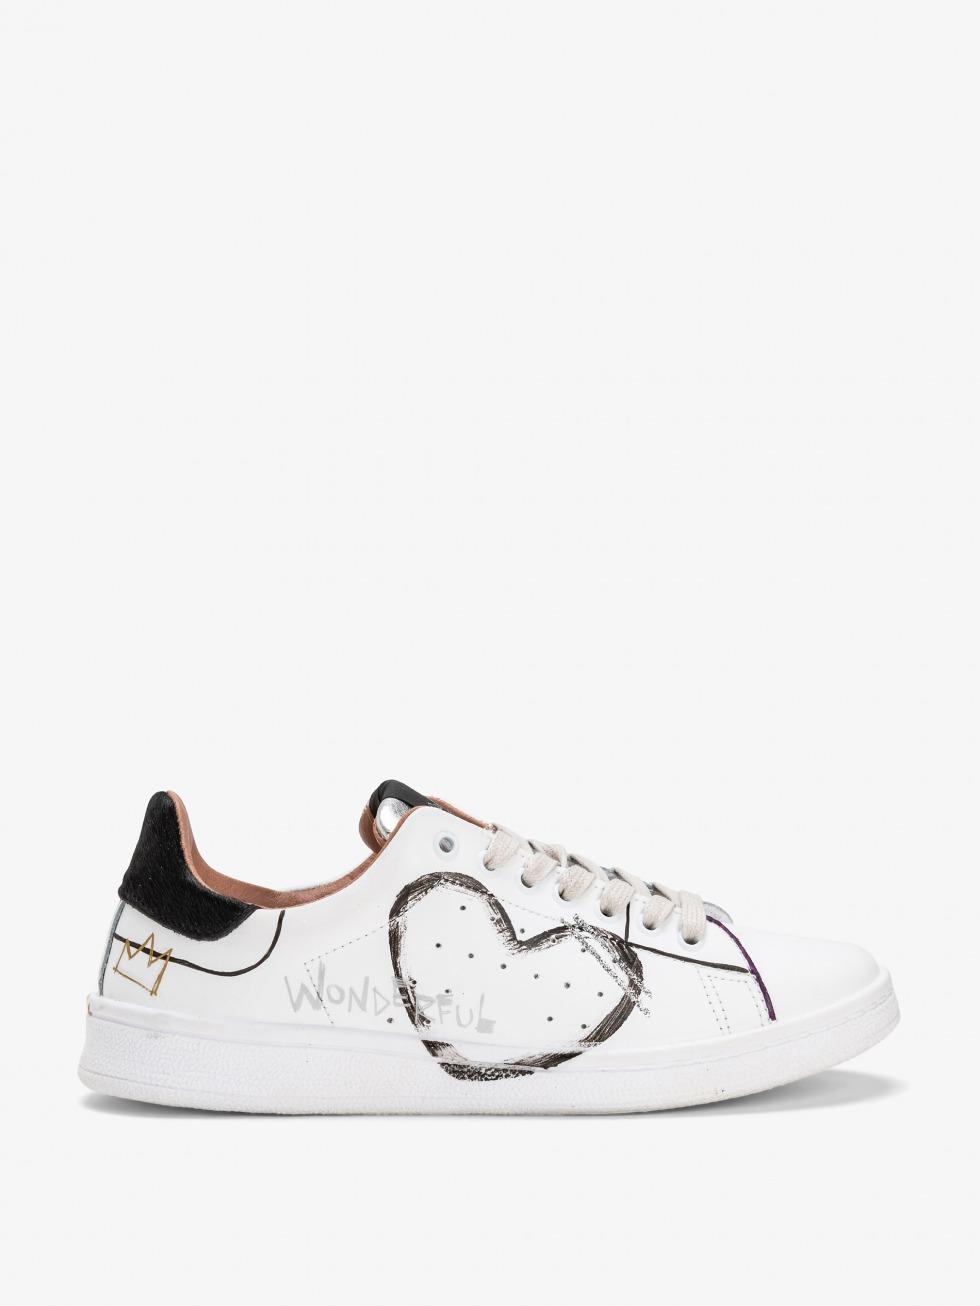 Daiquiri Sneakers - Black Writer Heart